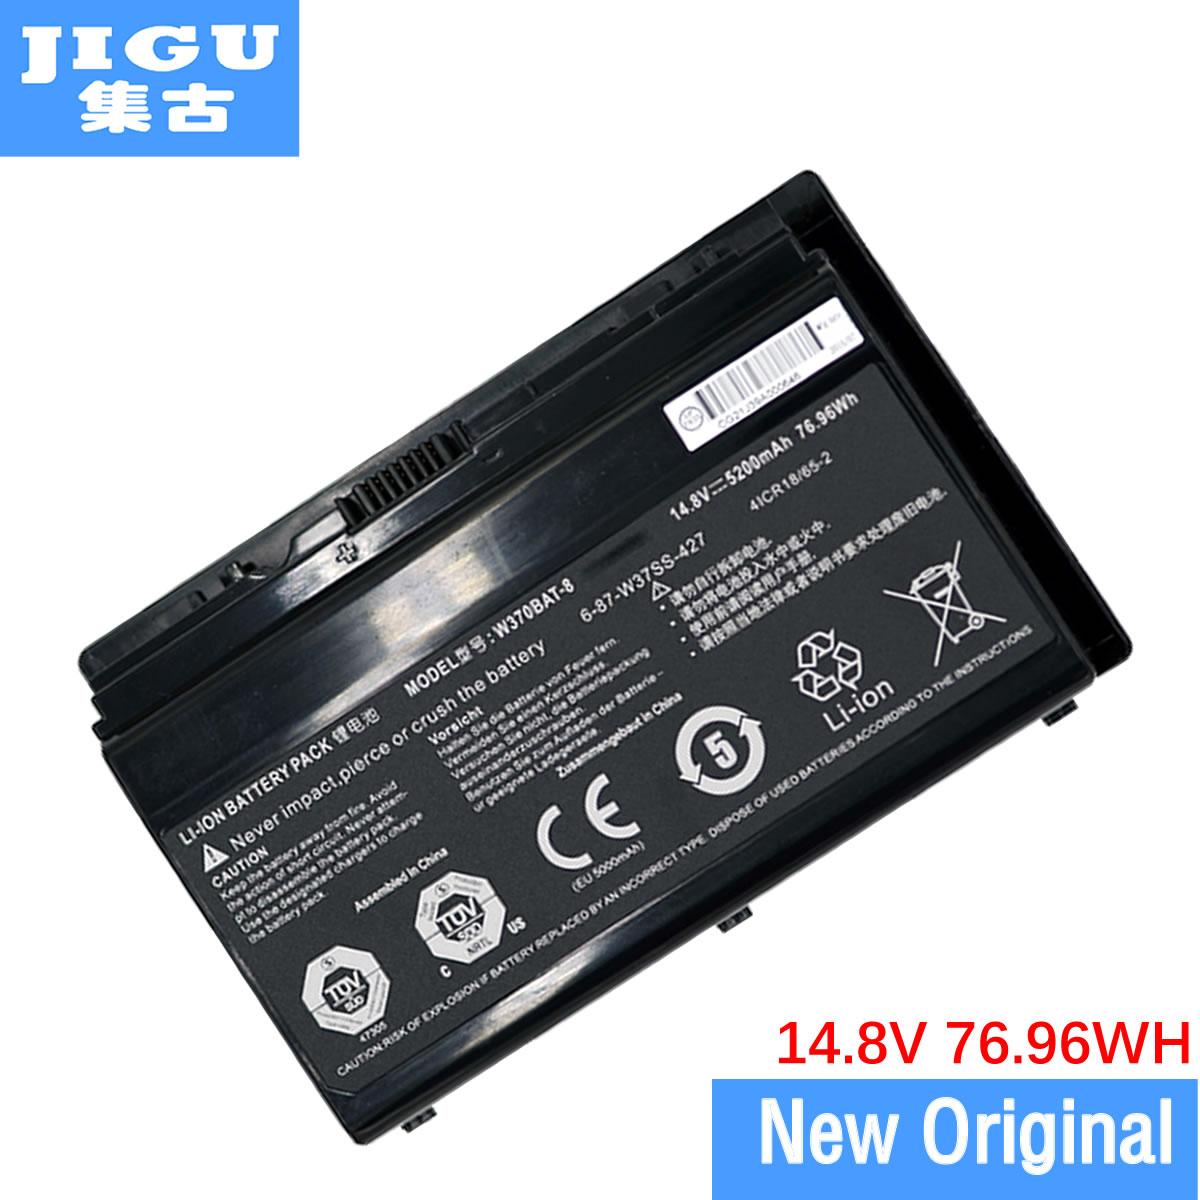 JIGU Laptop Battery 6-87-W370S-427 6-87-W370S-4271 FOR CLEVO K590S K790S NEXOC. G508II NP6350 NP6370 p370em W350ET W350ETQ original rechargeable clevo w370bat 8 li ion battery 6 87 w370s 4271 6 87 w37ss 427 k590s laptop battery 14 8v 5200mah 76 96wh